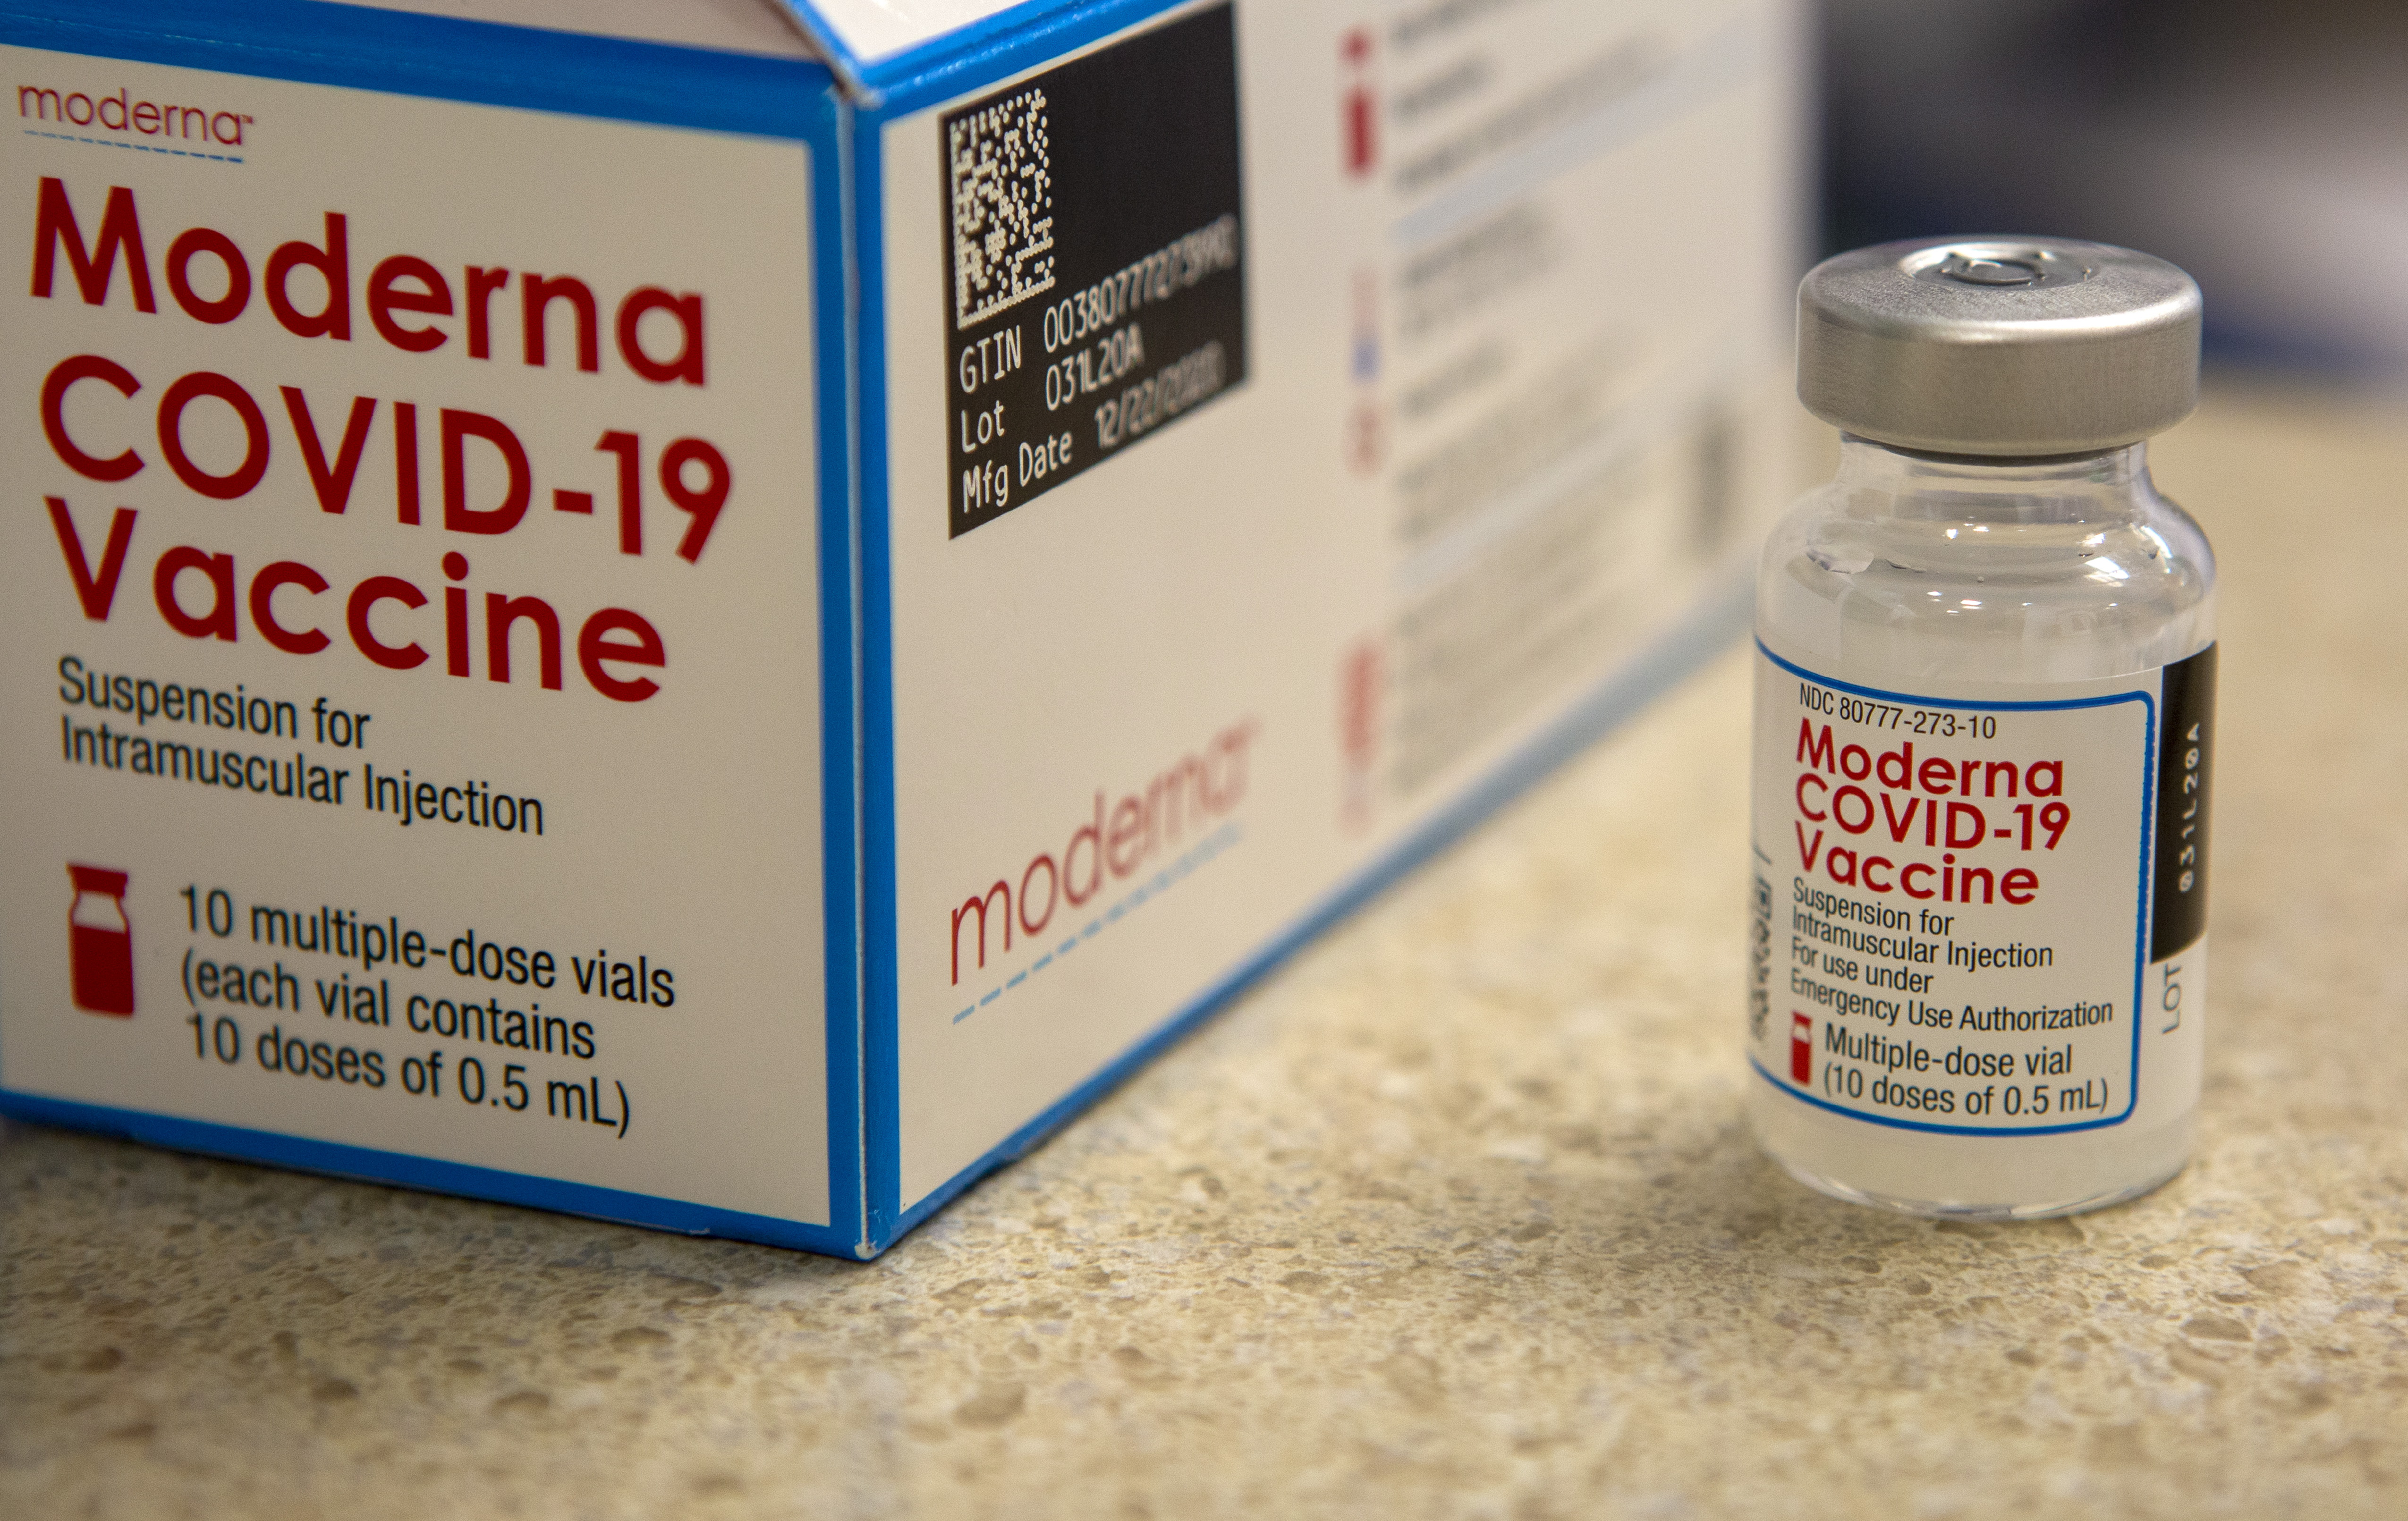 Covid-19 Vaccinations in USA